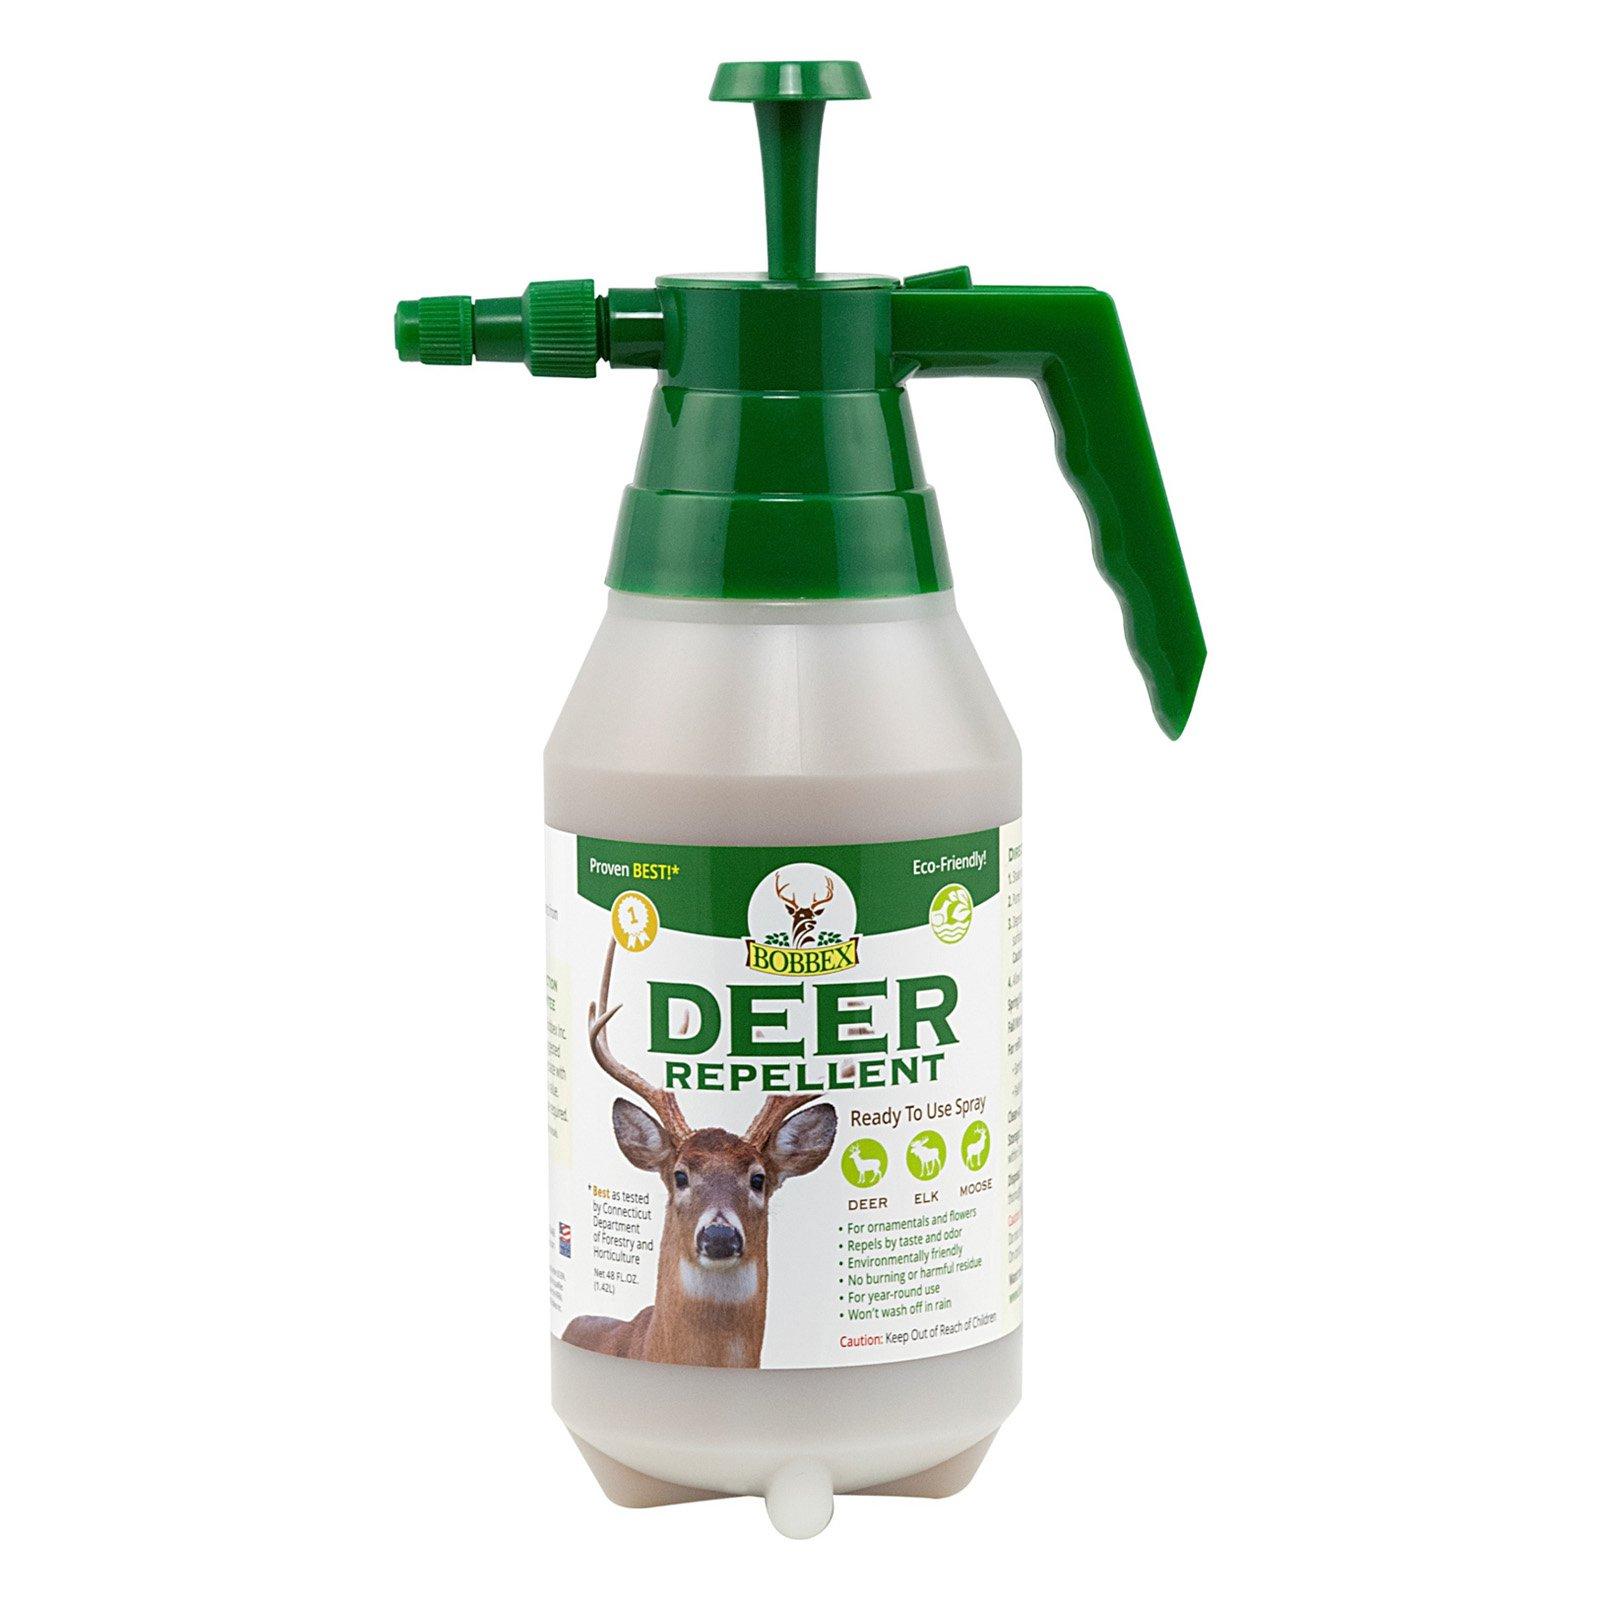 Bobbex 48 oz. Deer Repellent Spray